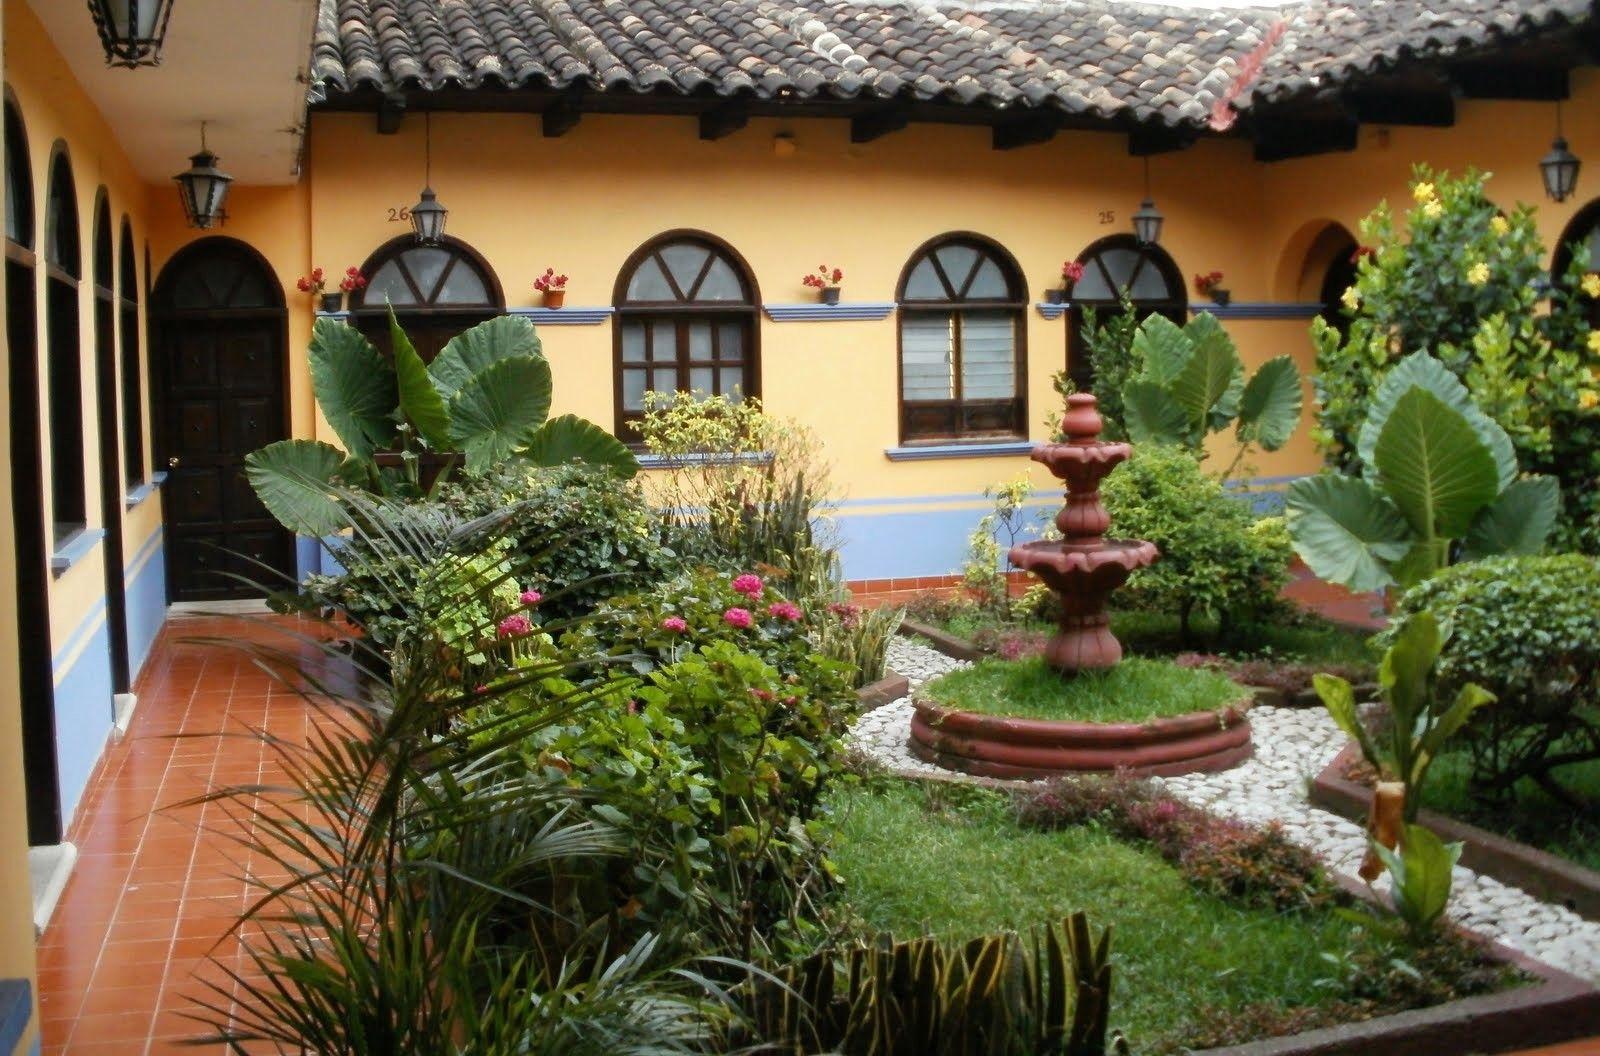 Spanish Style House Plans Central Courtyard Ideas Decoratorist 72793 Courtyard Gardens Design Spanish Garden Spanish Courtyard